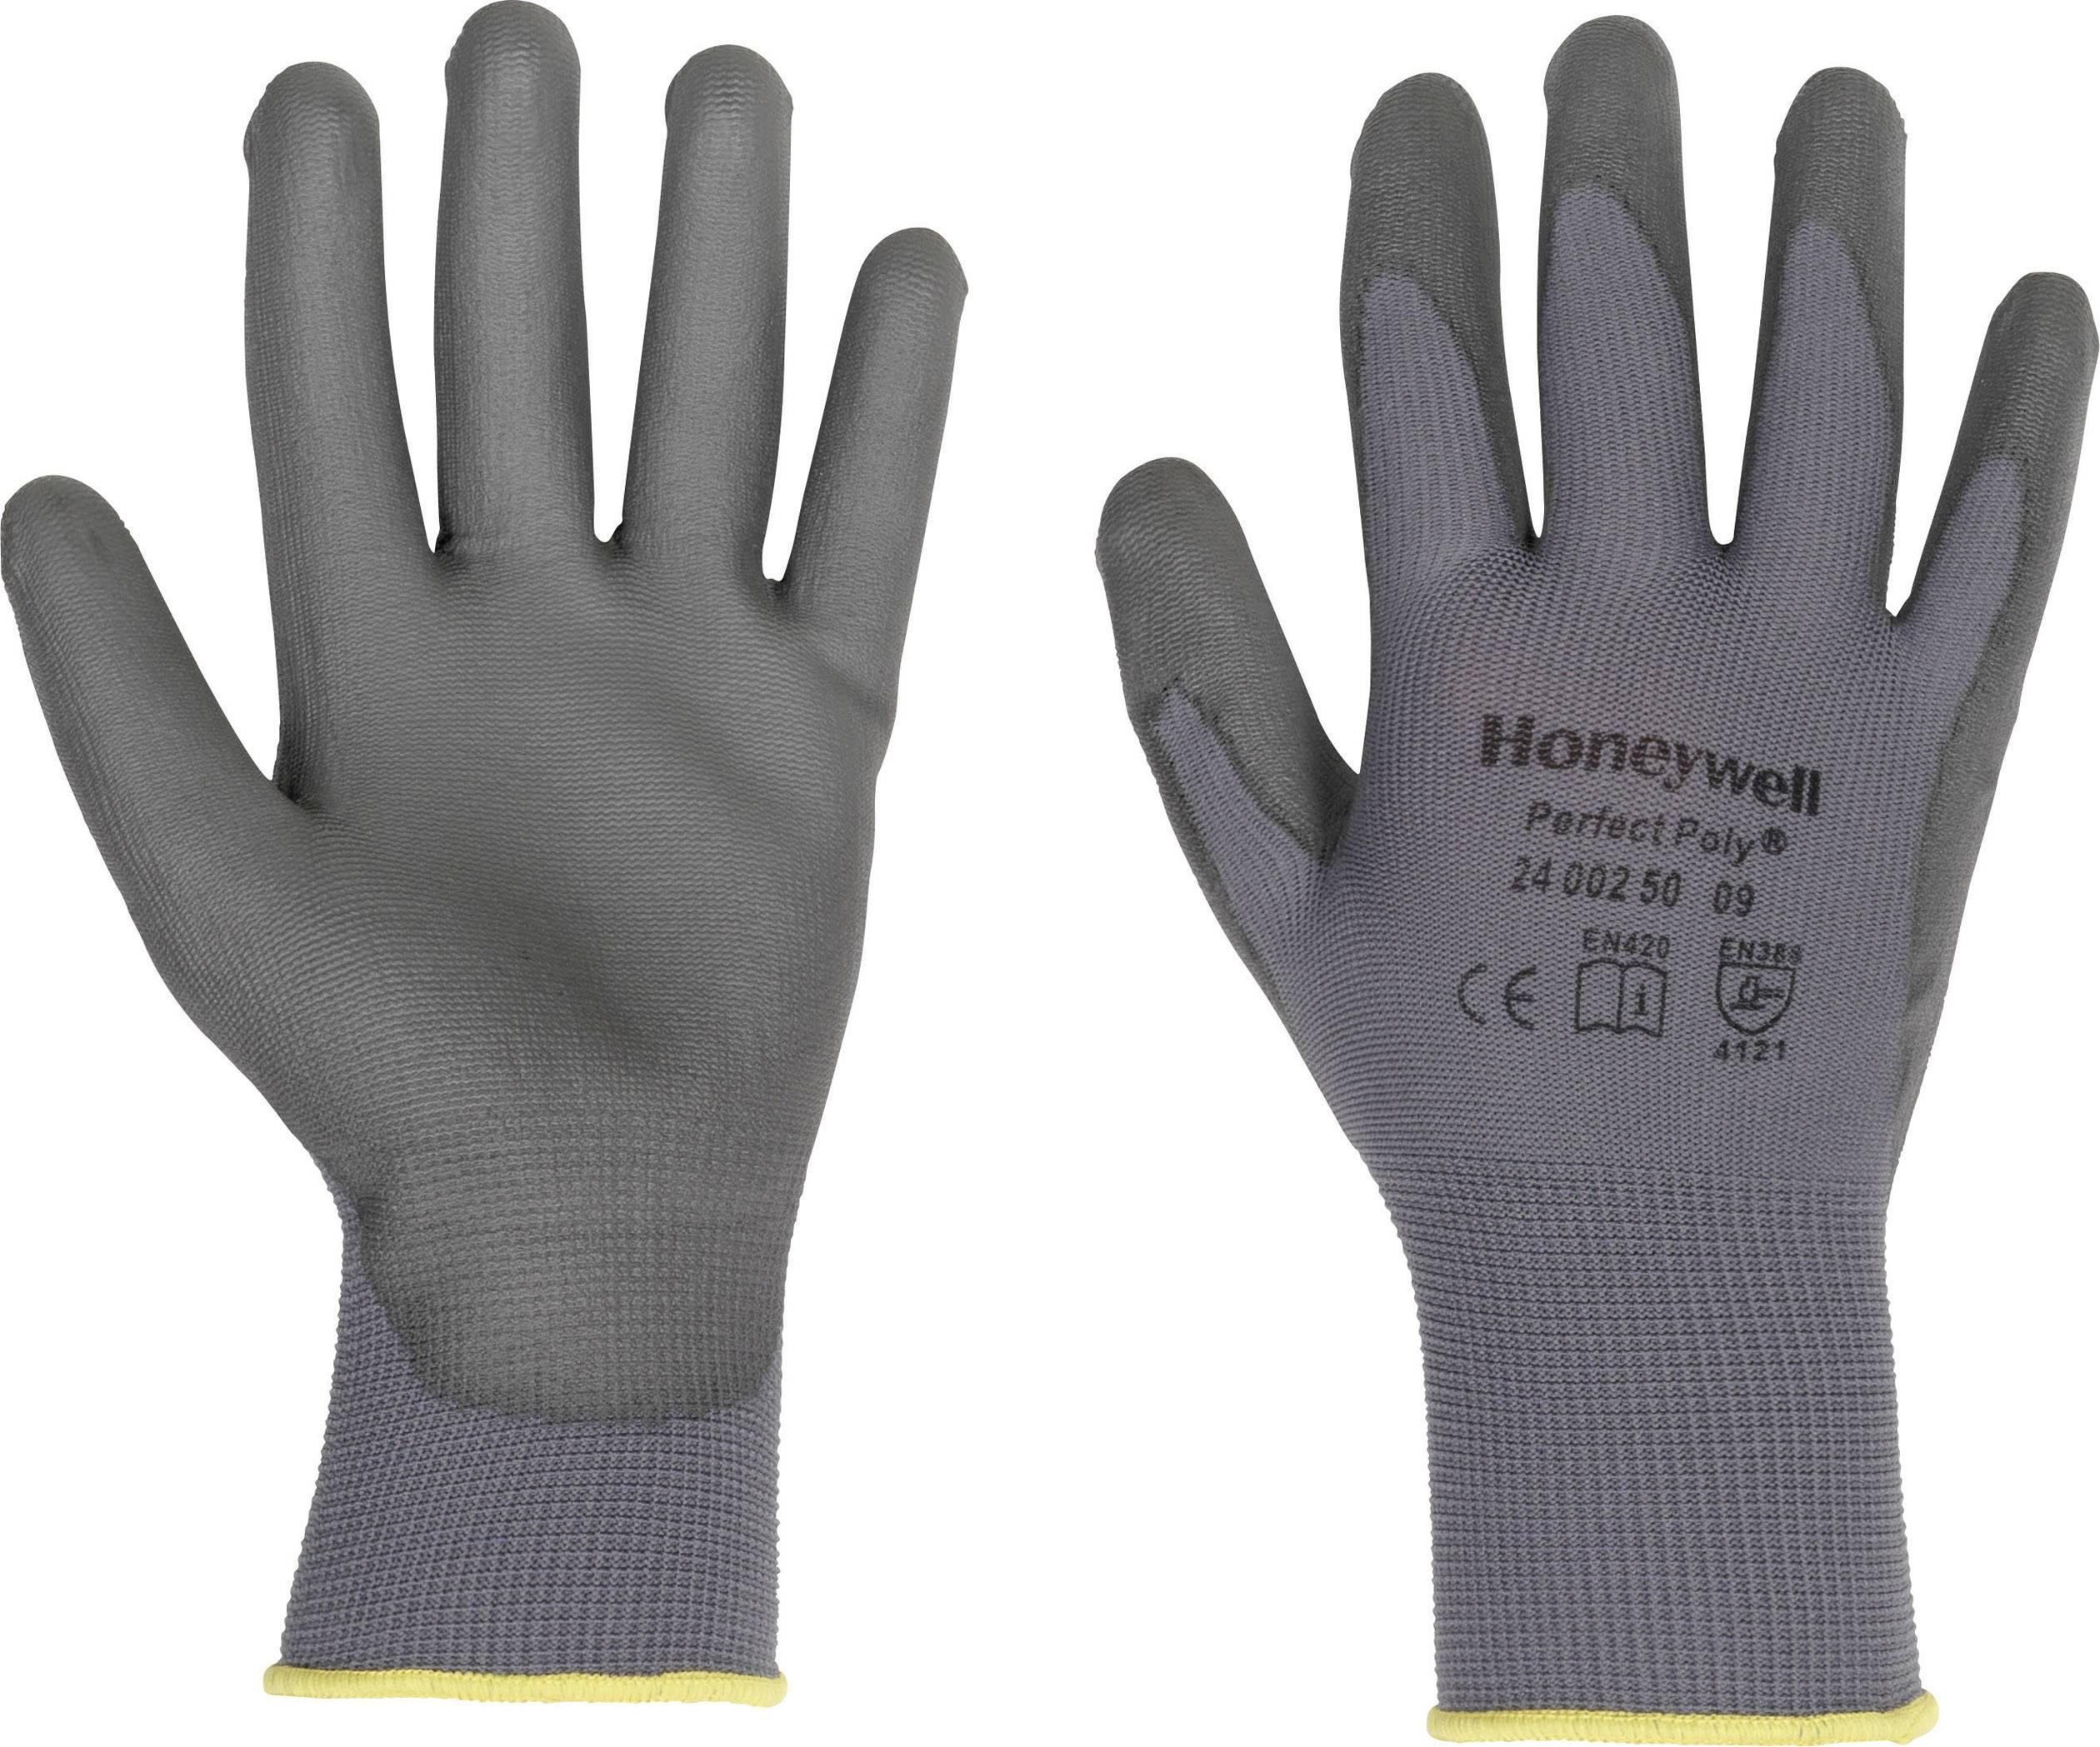 Pracovné rukavice Perfect Fit GANTS GRIS PERFECTPOLY 2400250, velikost rukavic: 9, L